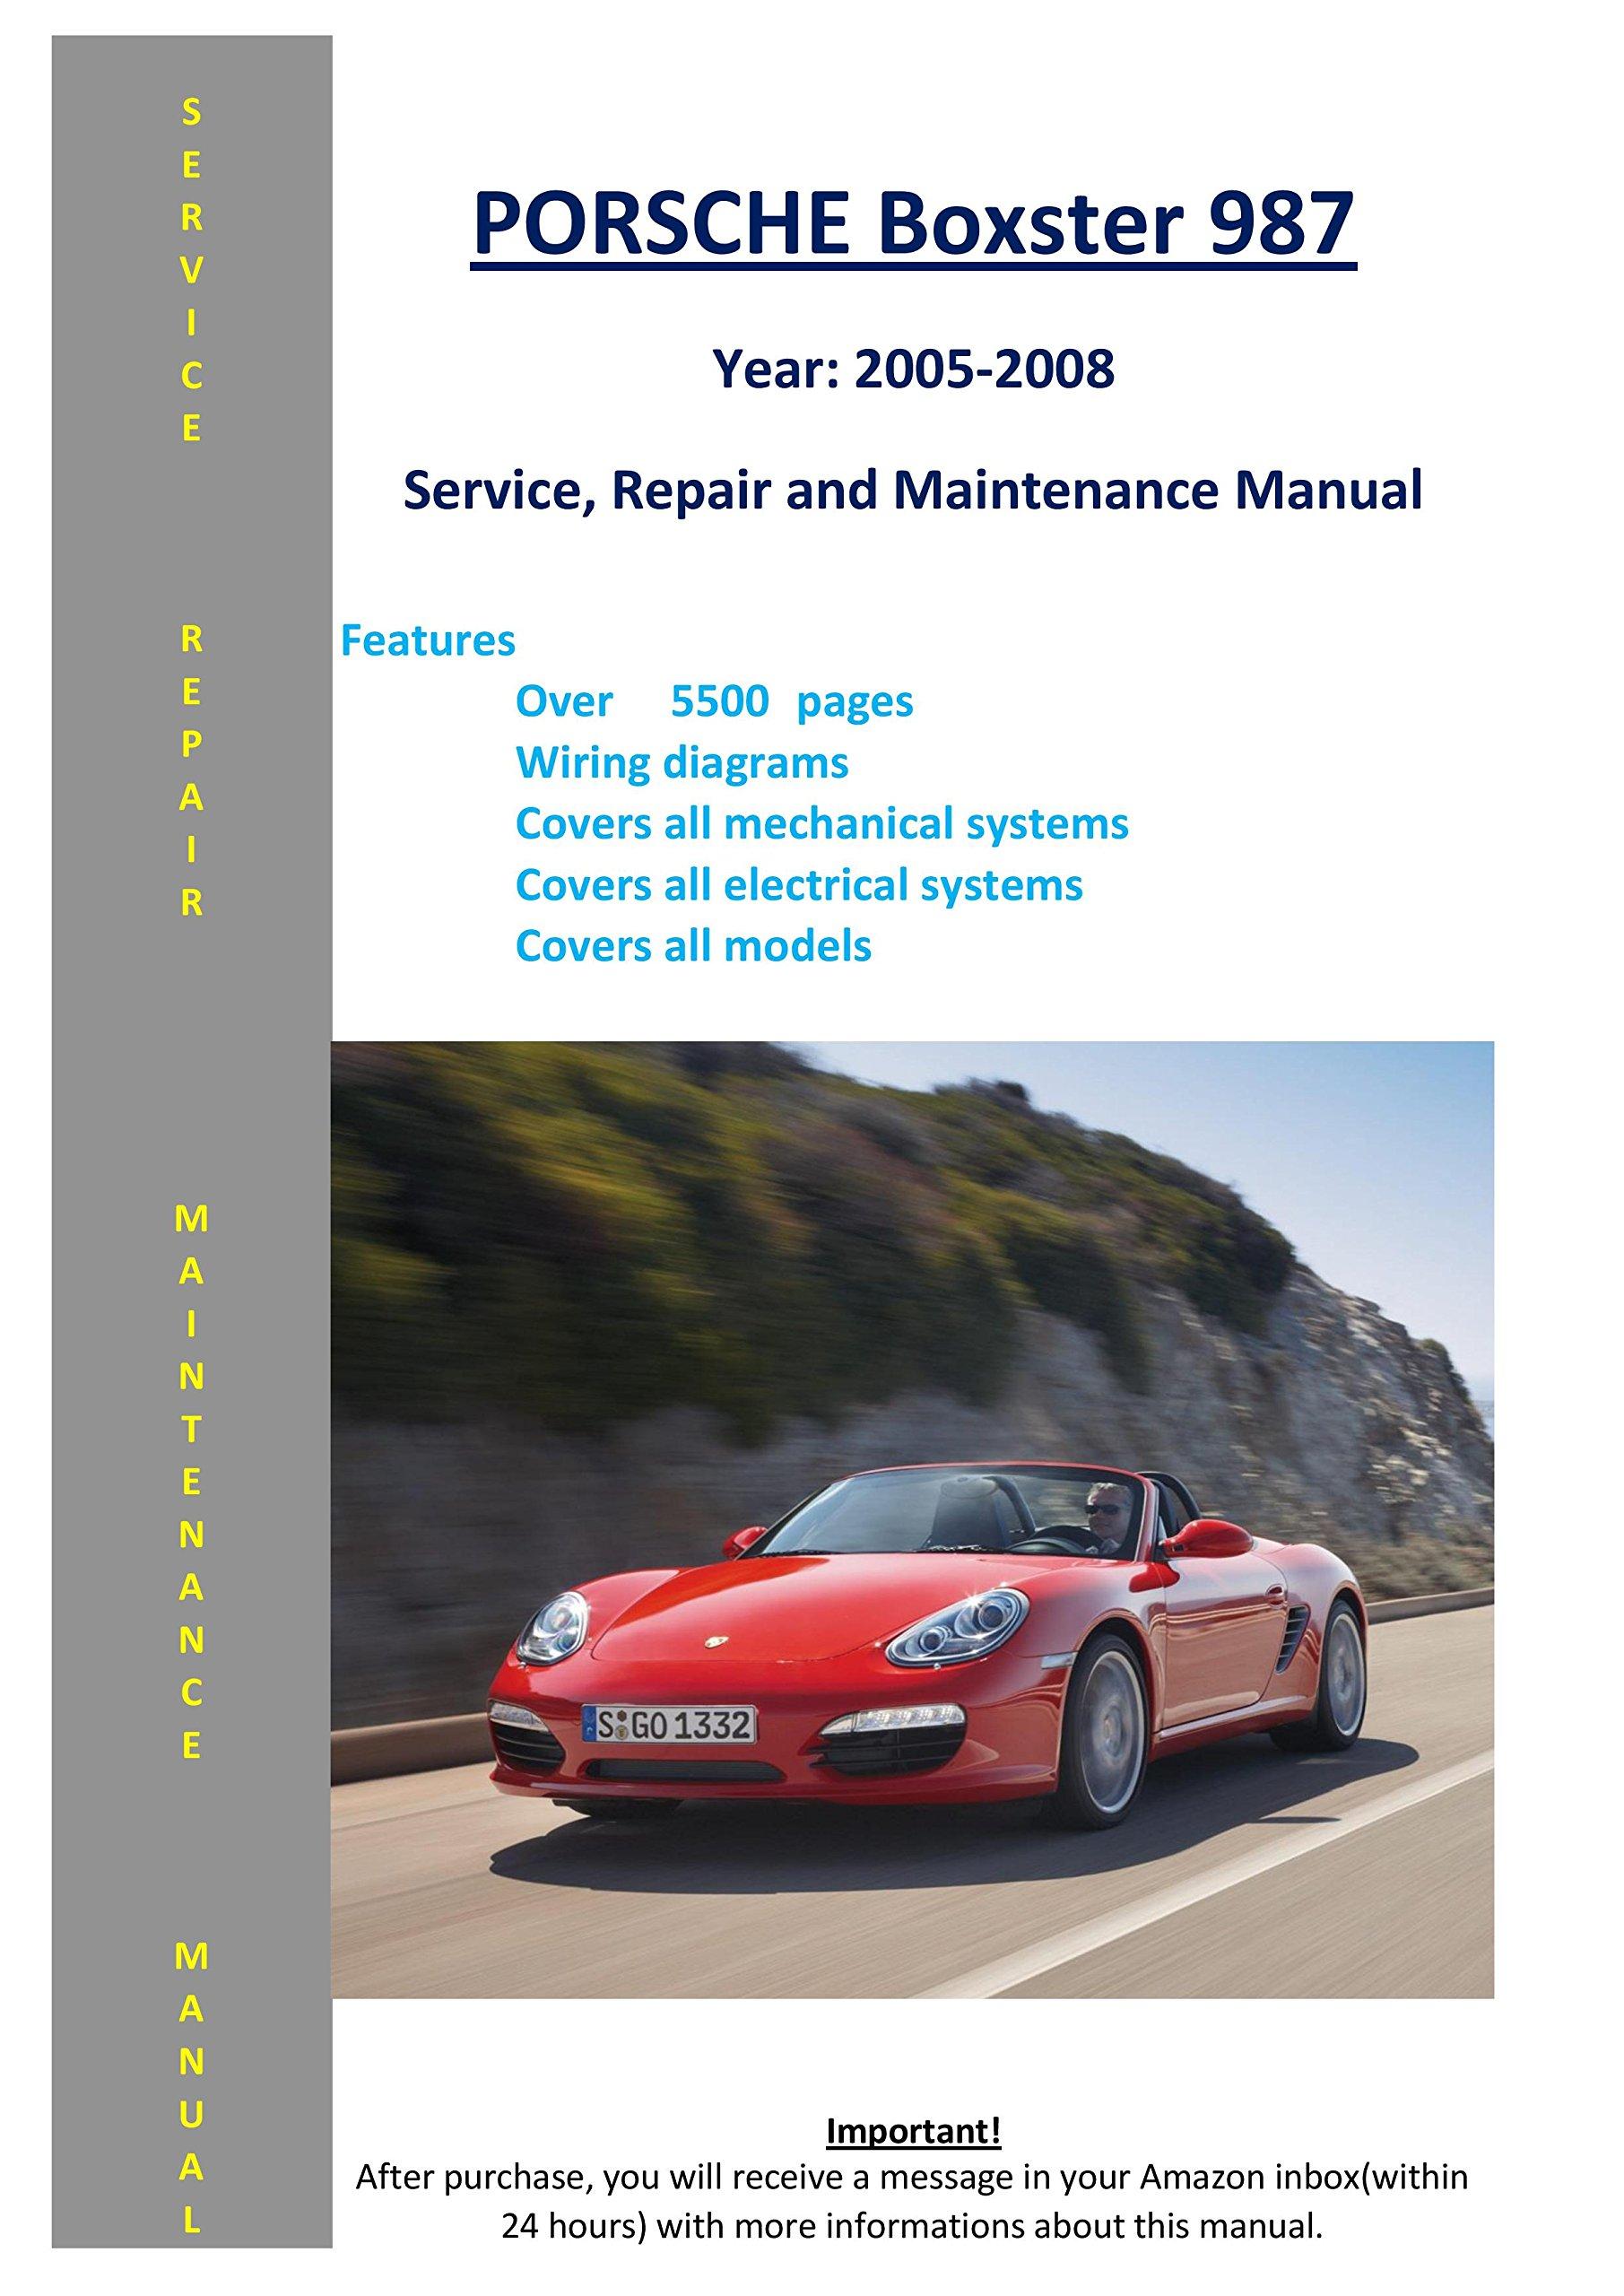 porsche boxster 987 from 2005-2008 service repair maintenance manual map –  2010